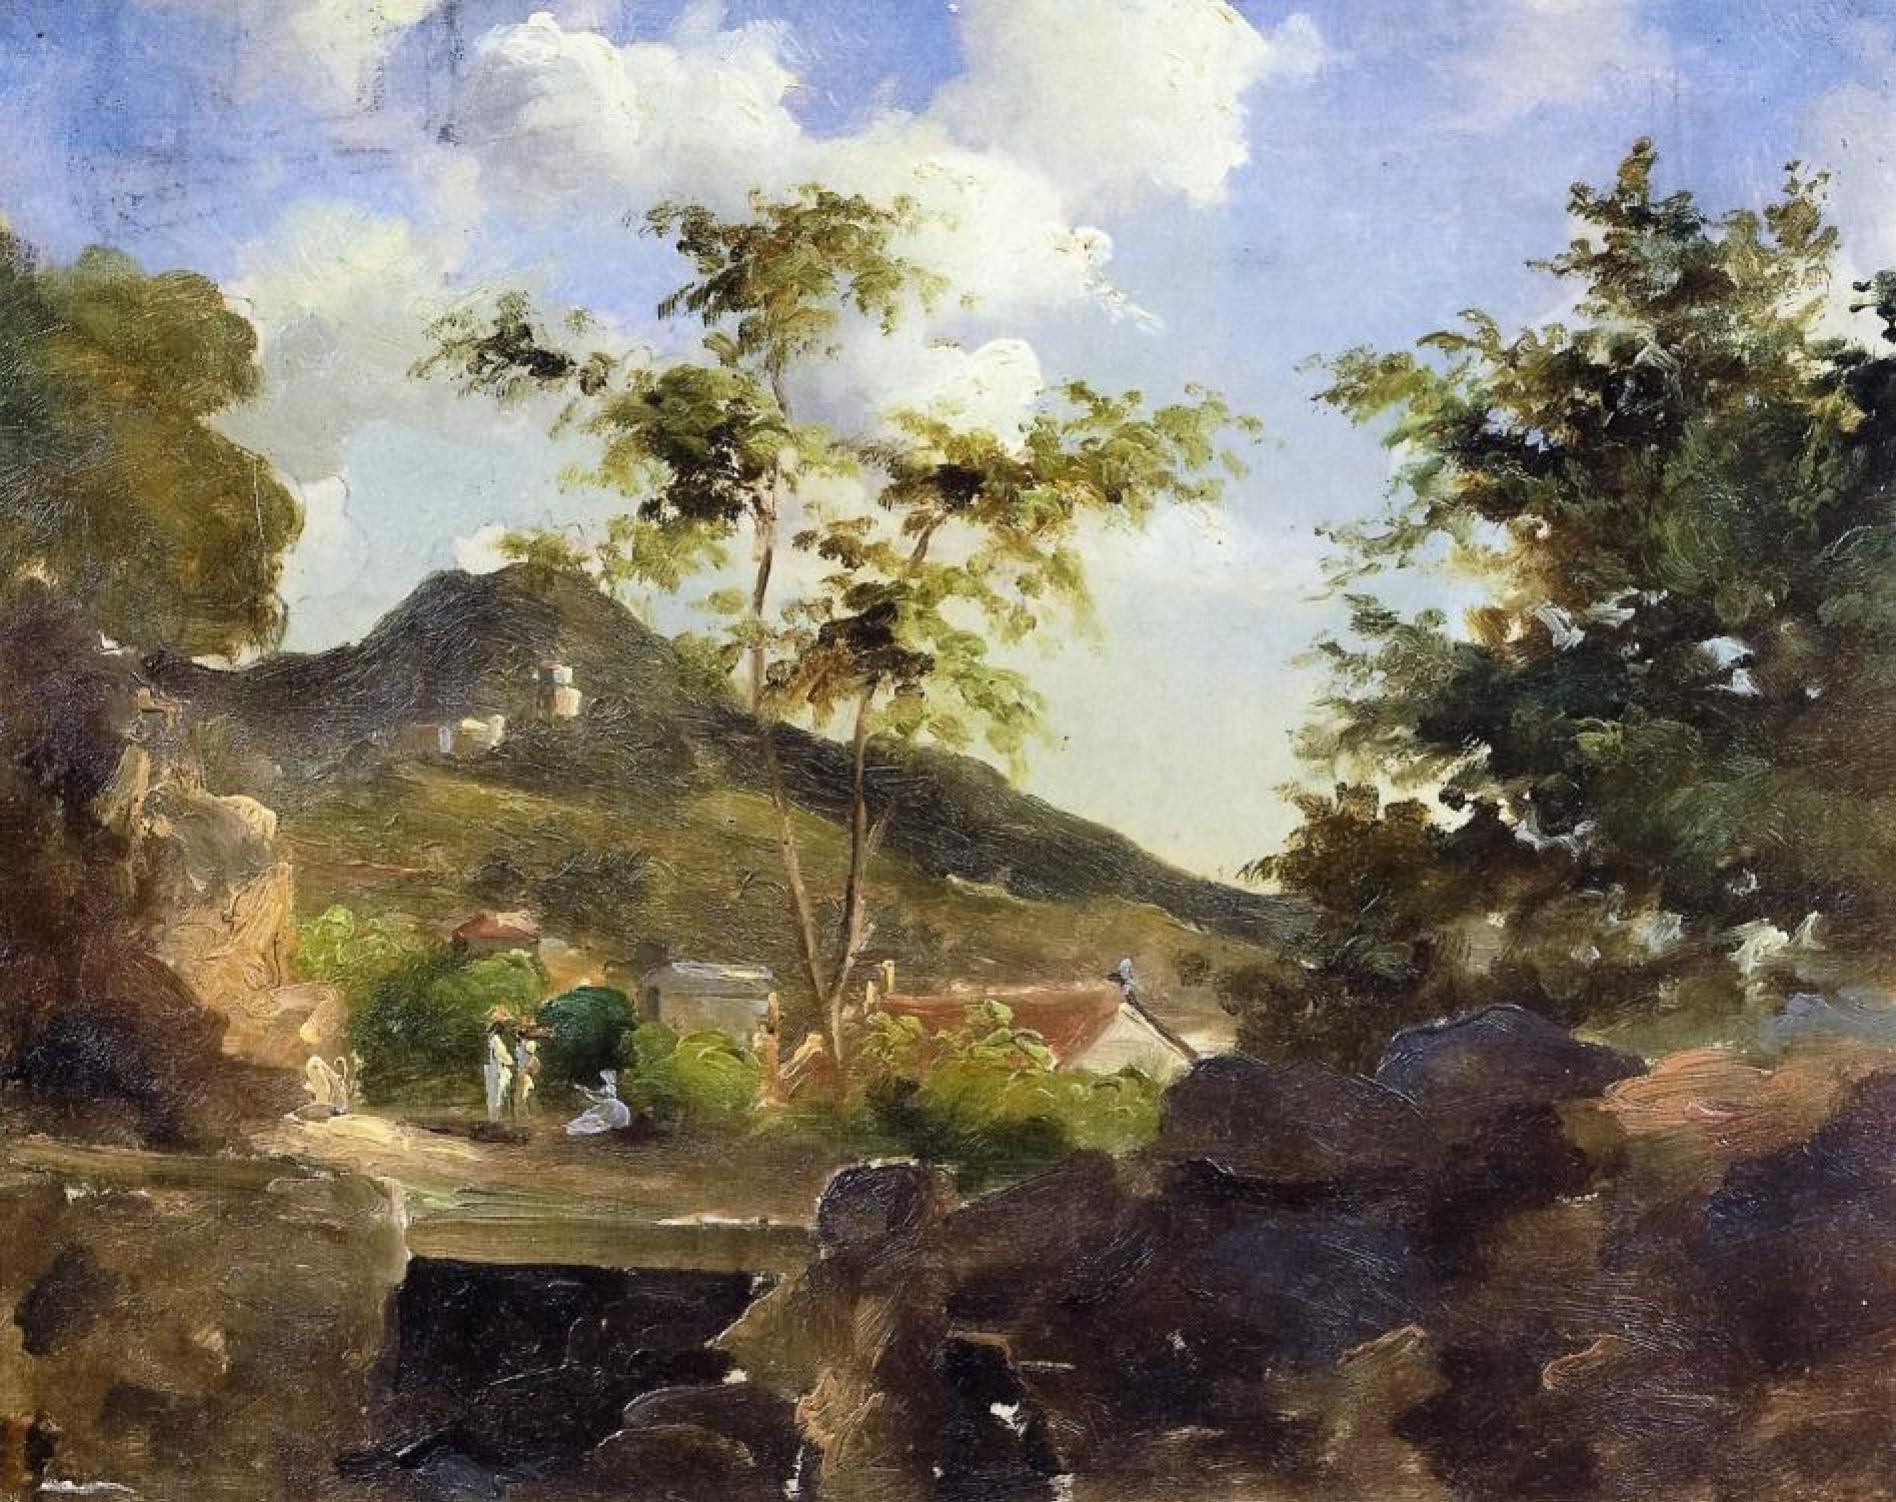 Камиль Писсарро. Деревня у подножья горы, Сент-Томас